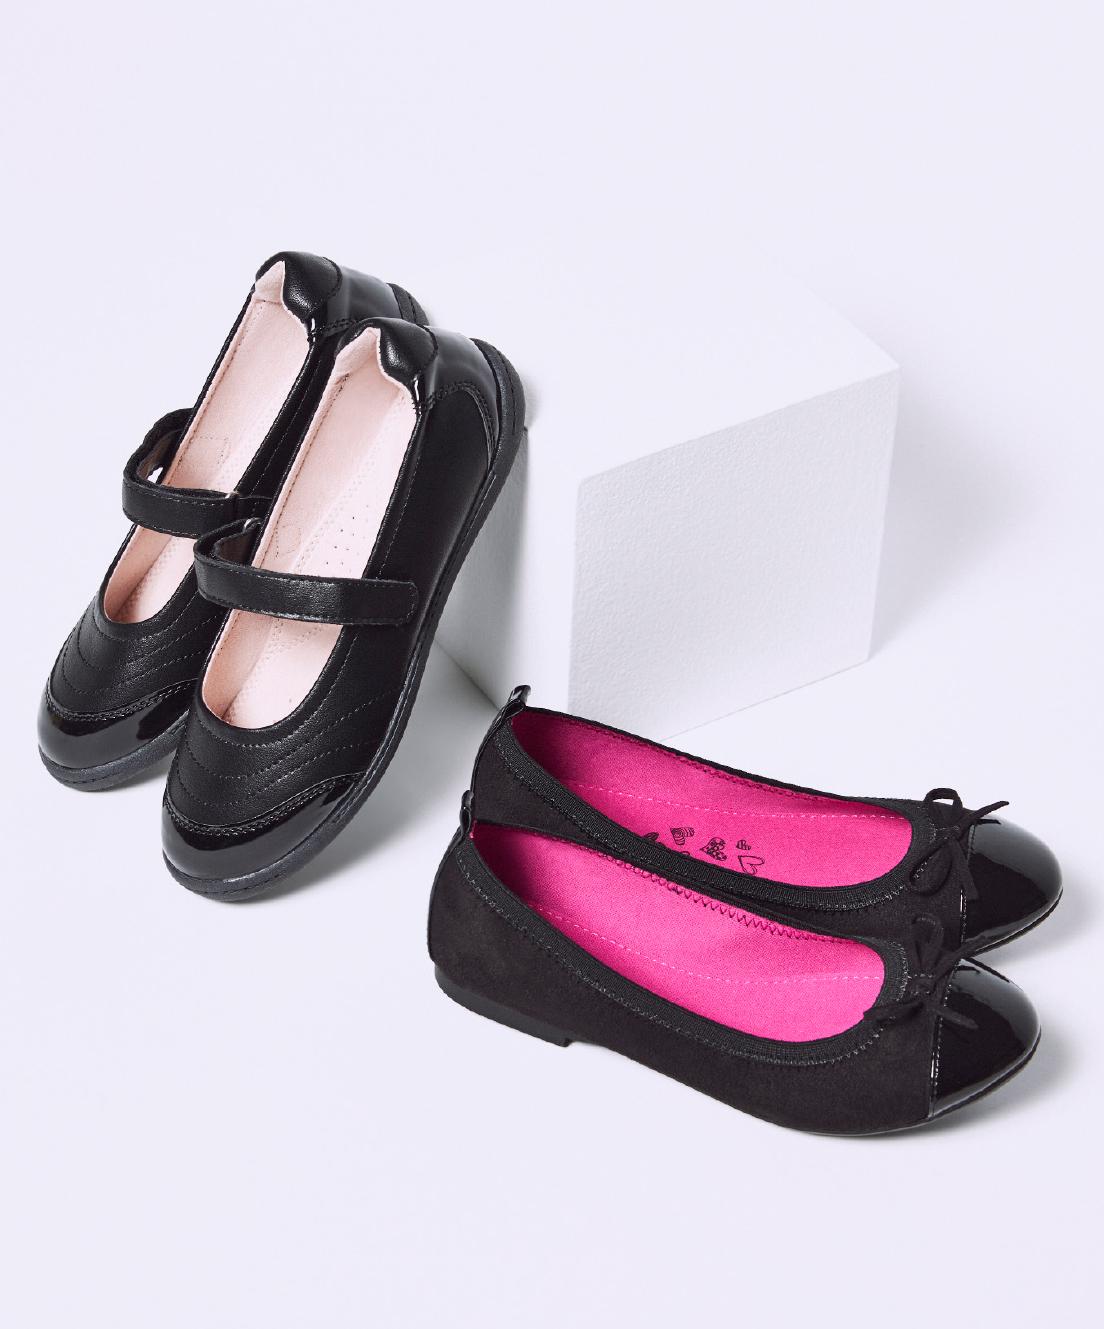 Boys School Shoes Size 9 10 10.5 11 12 13 1 2 3